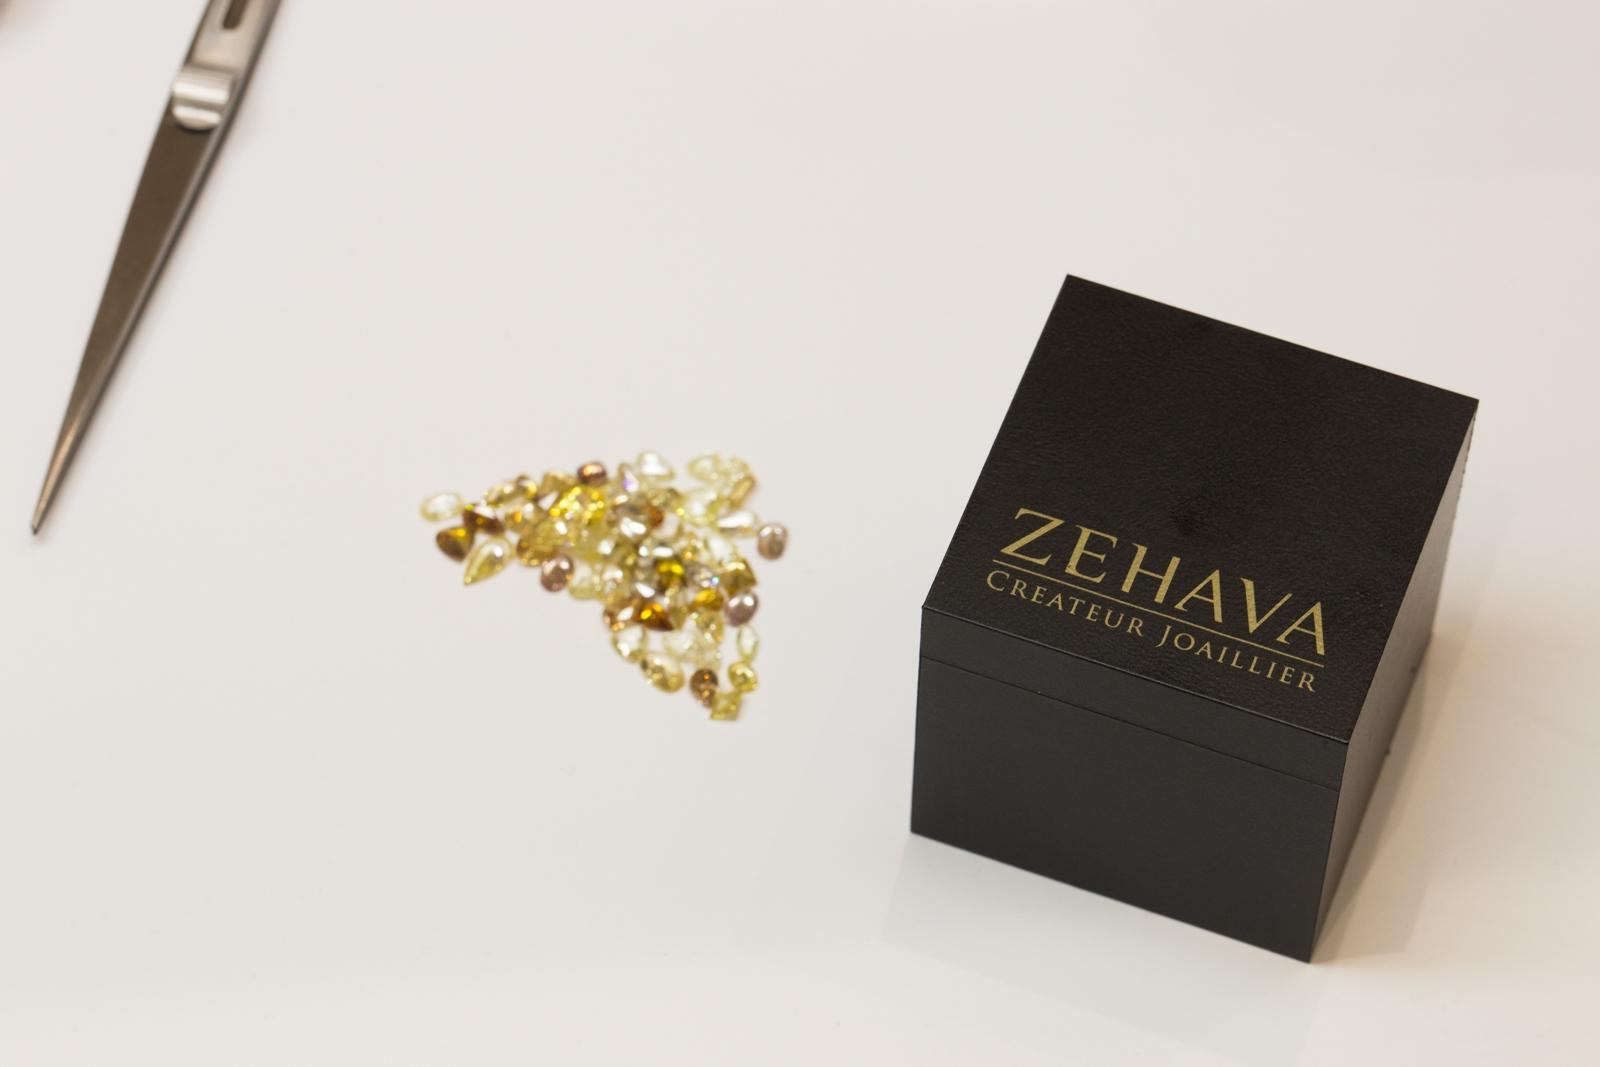 Zehava Createur Joiallier (@zehavacreateurjoaillier) Cover Image